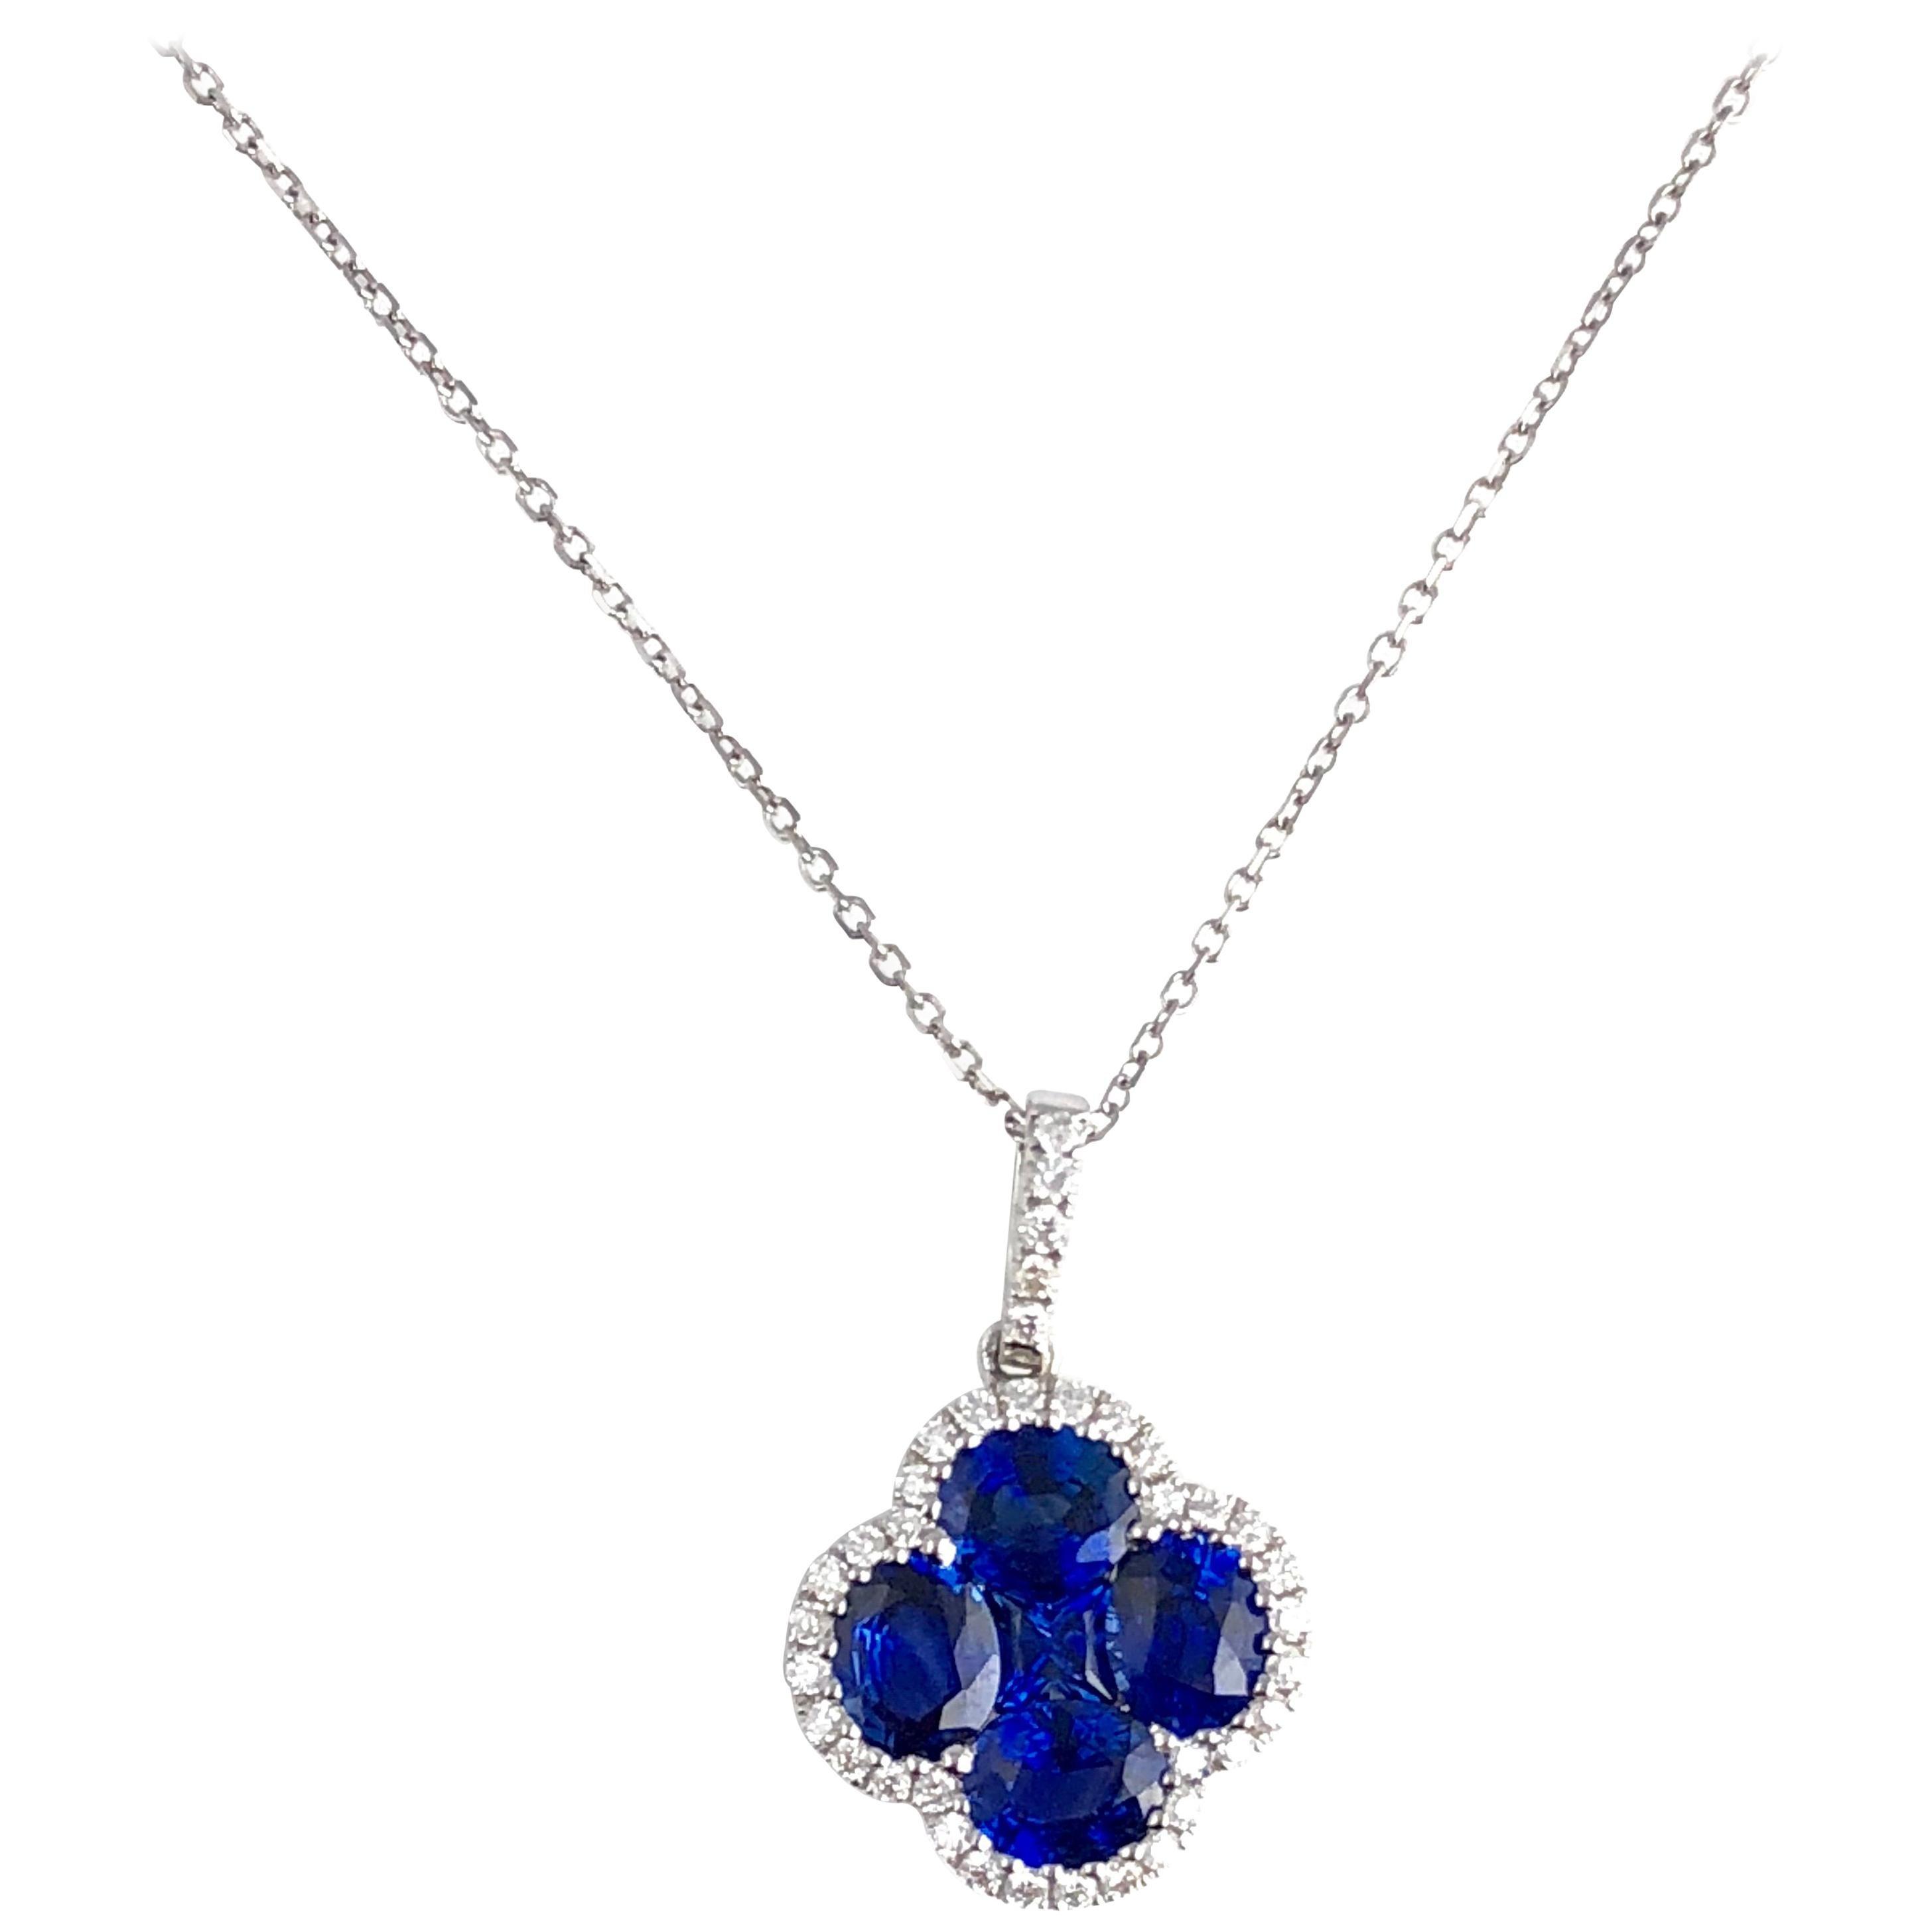 DiamondTown 1.81 Carat Vivid Blue Sapphire and Diamond Clover Pendant